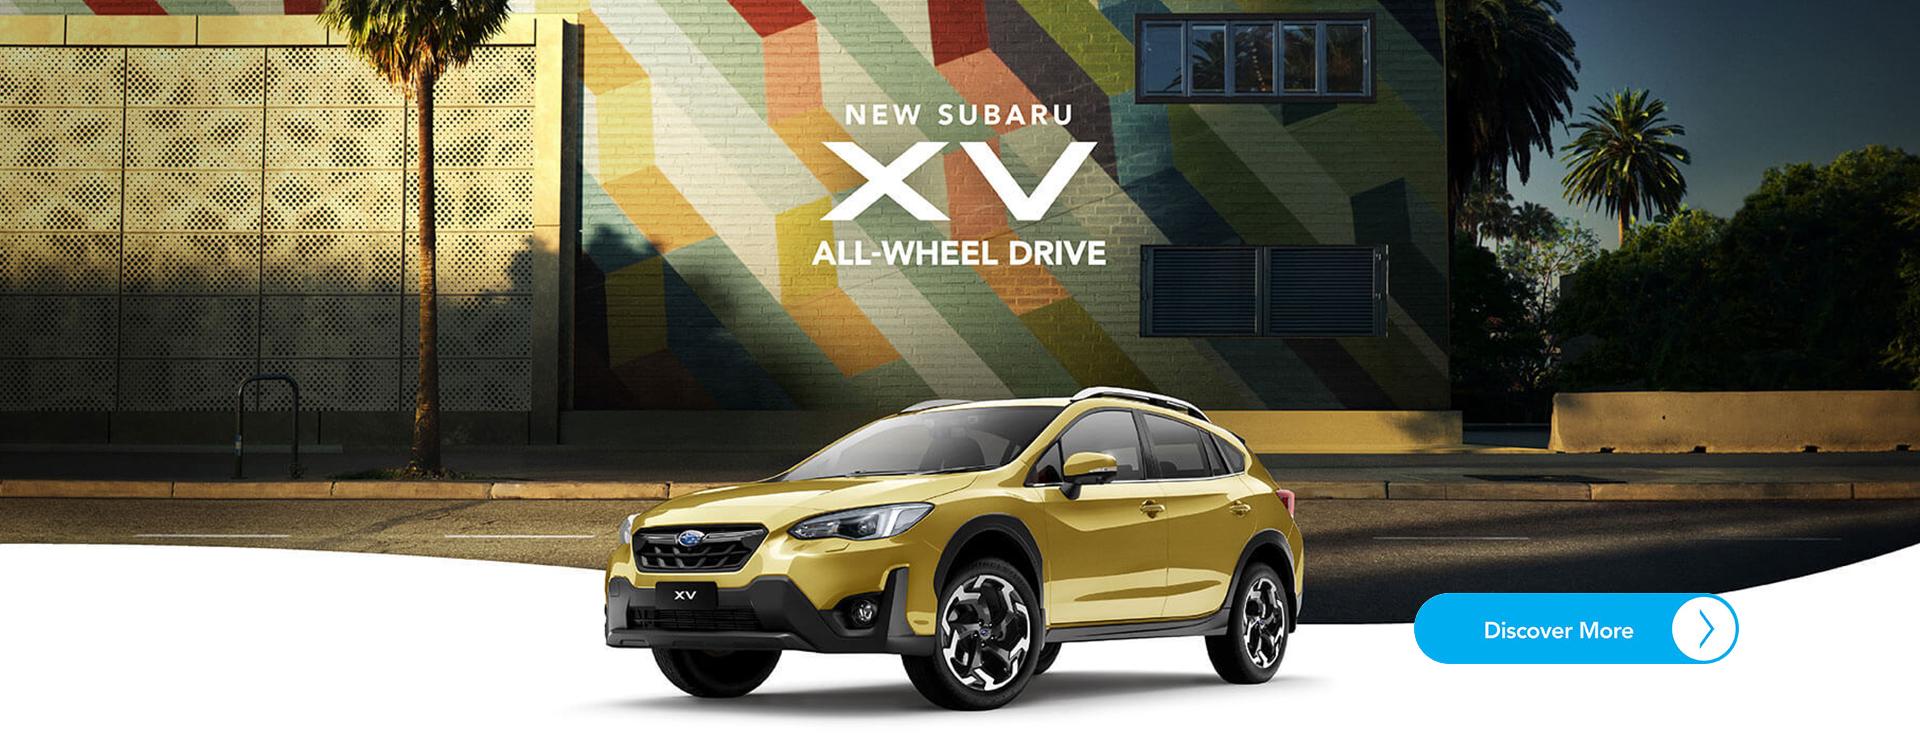 New Subaru XV. Take fun to the next level with the newly imagined 2021 Subaru XV AWD, the original and multi award winning compact SUV.